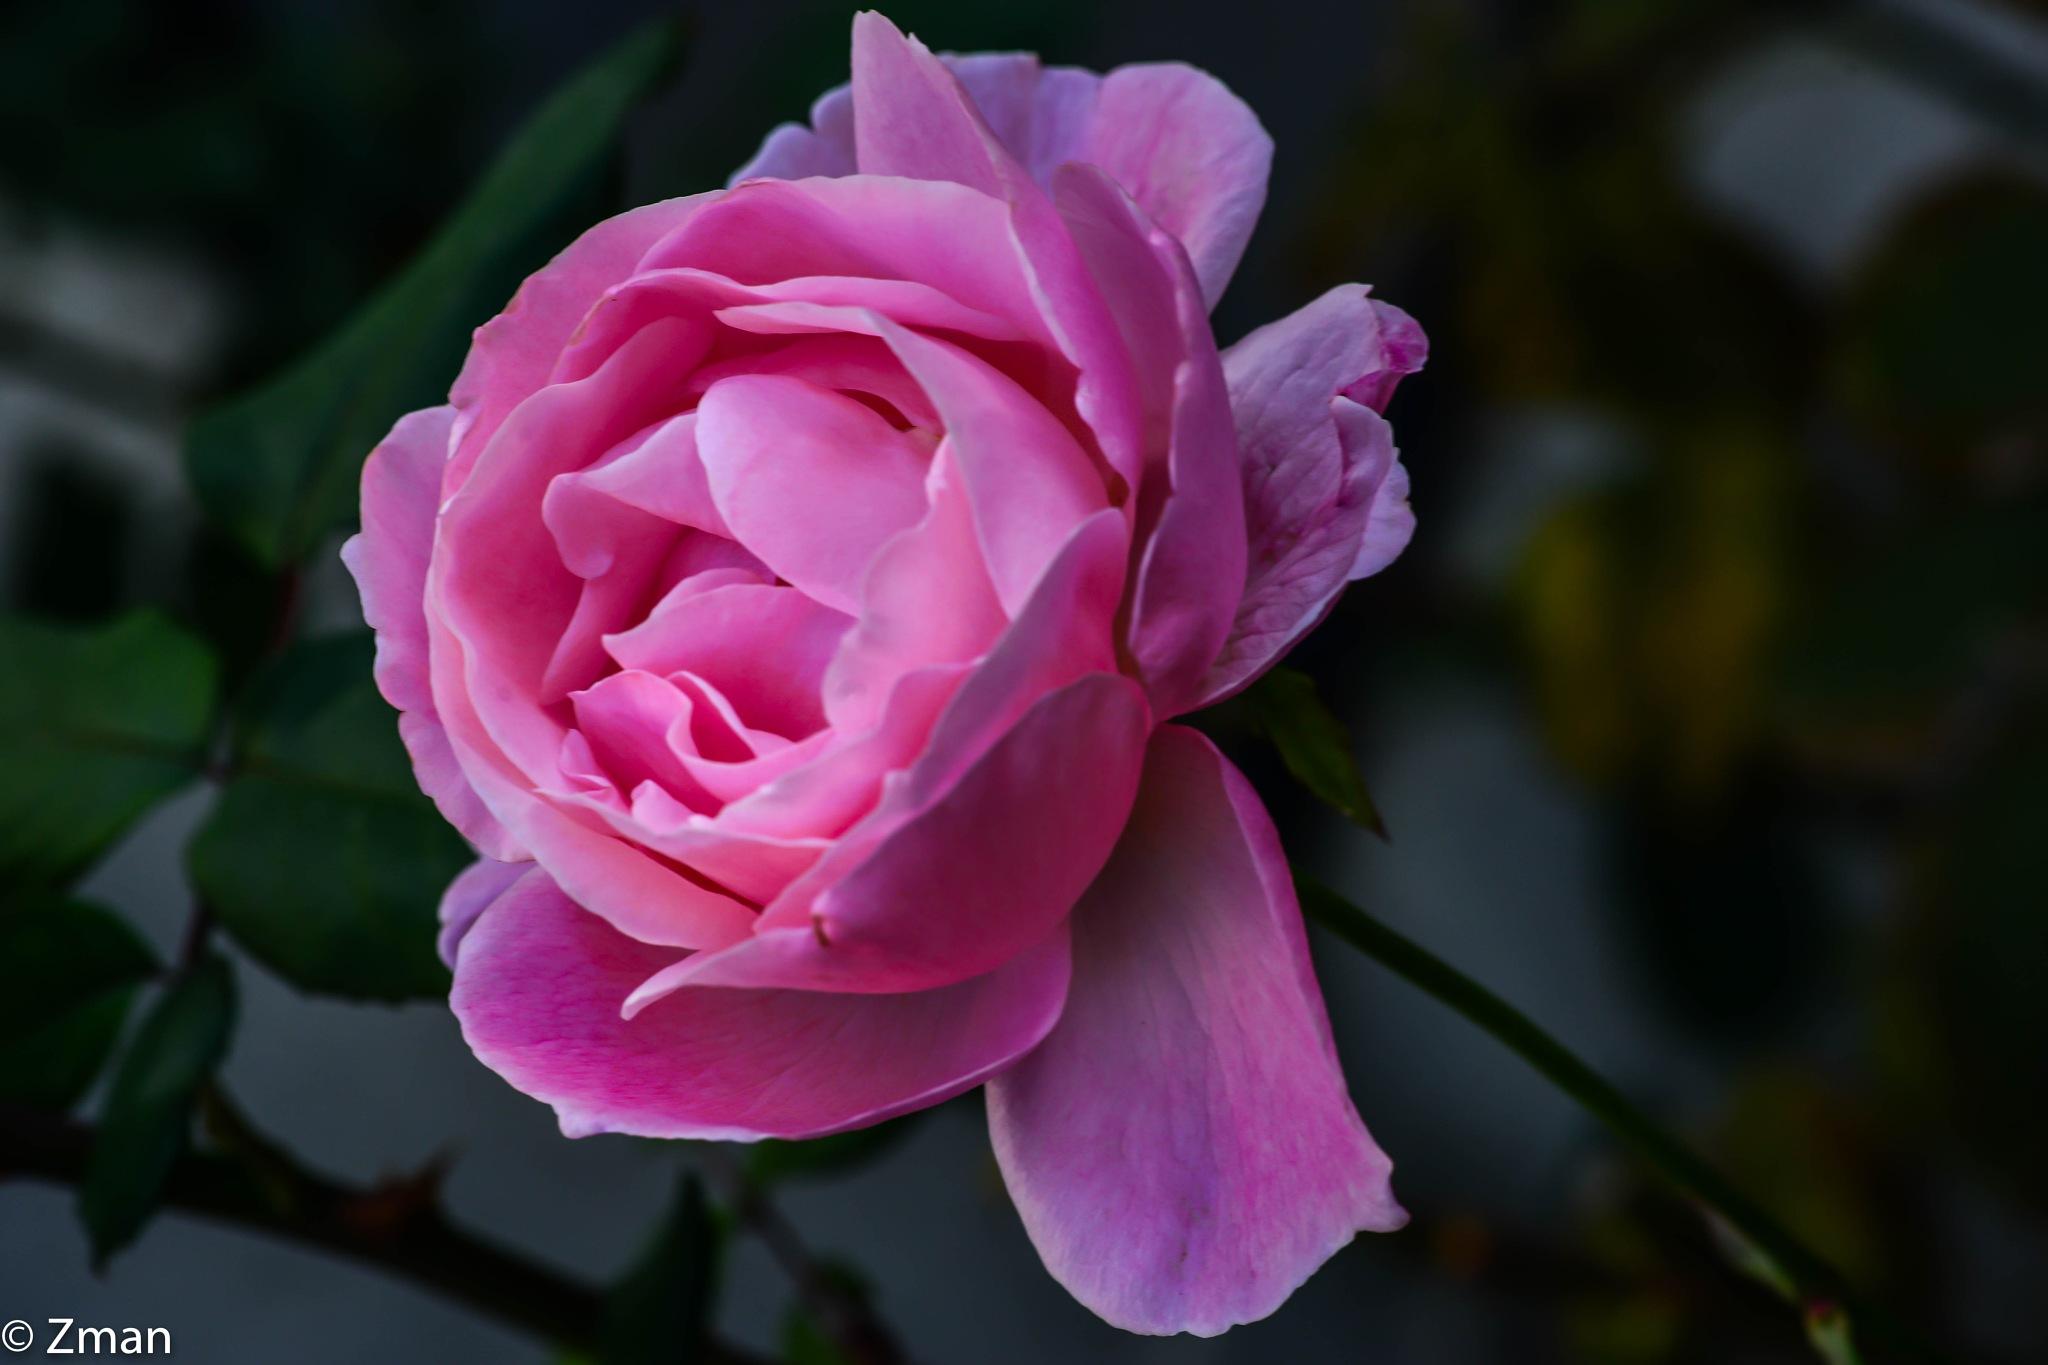 All Pink by muhammad.nasser.963